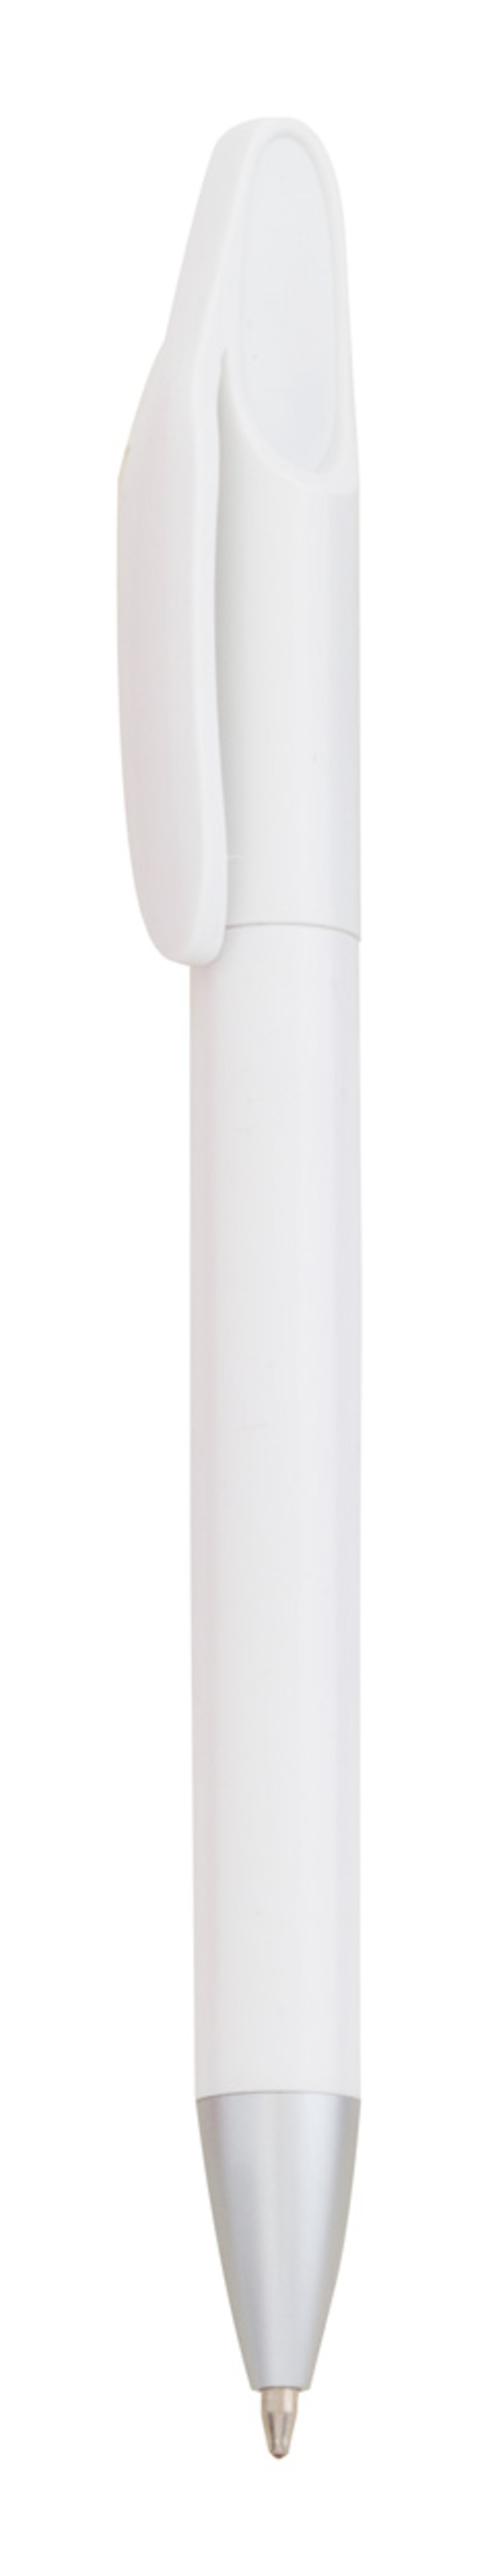 Britox ballpoint pen